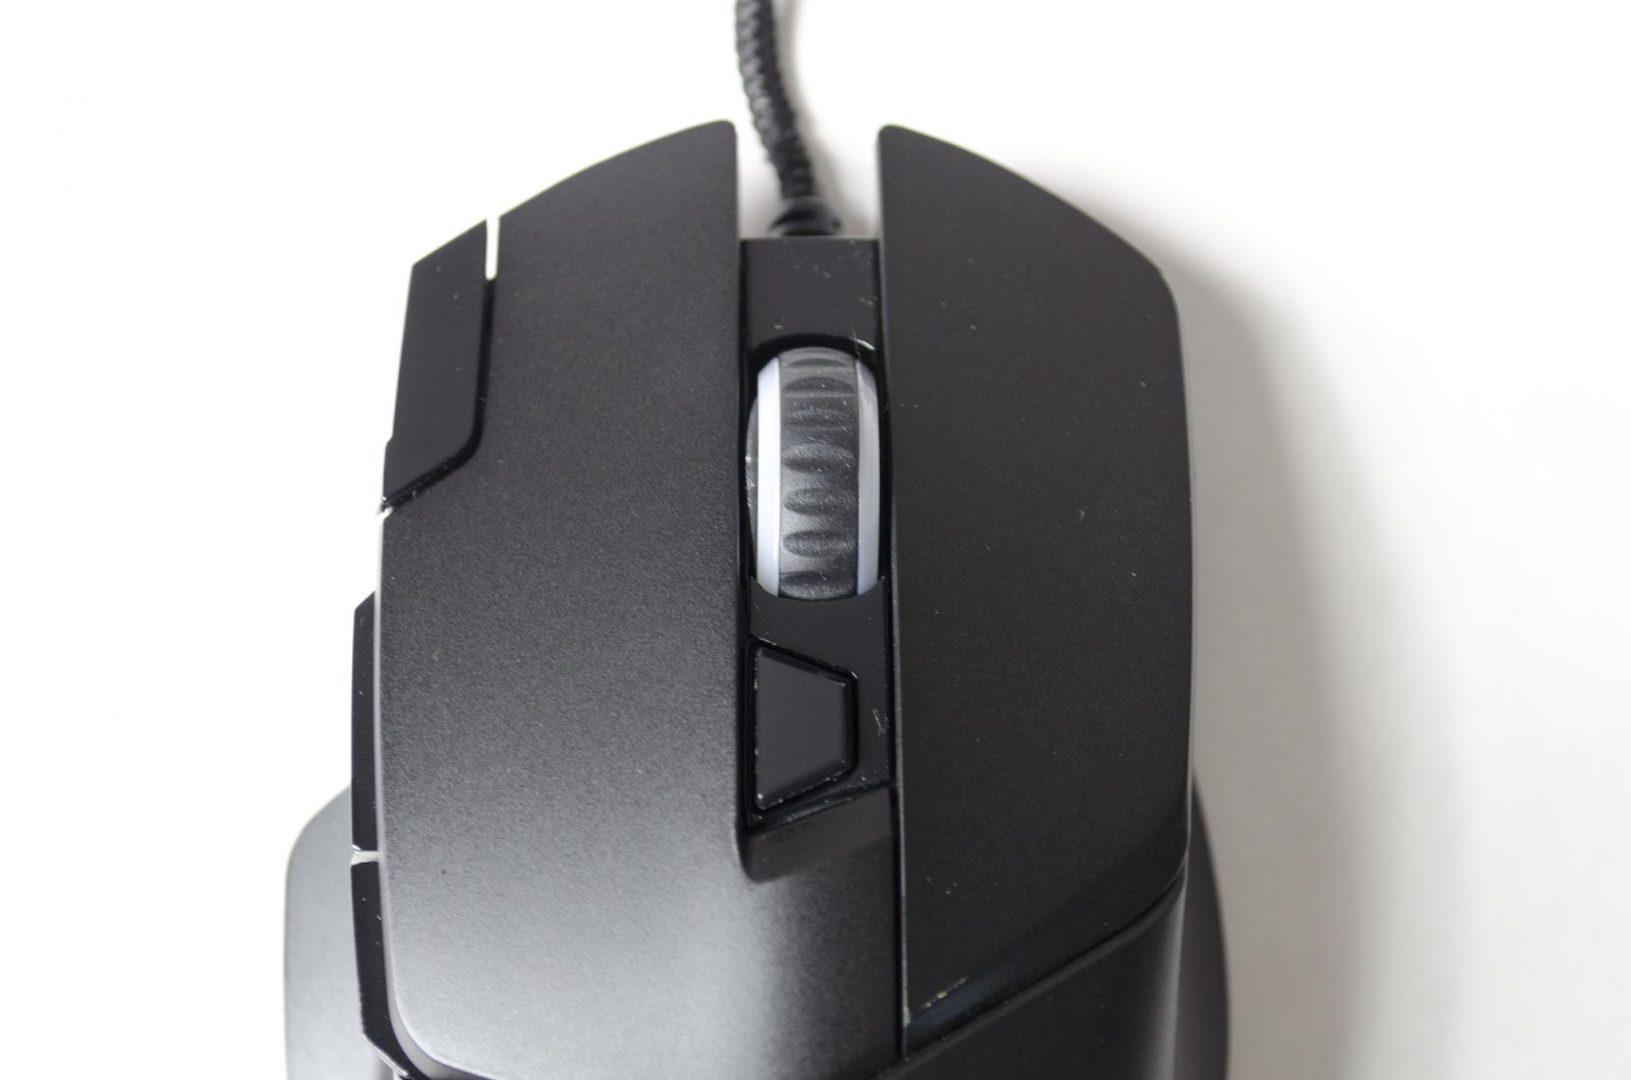 tesoro ascalon spectrum rgb gaming mouse_12